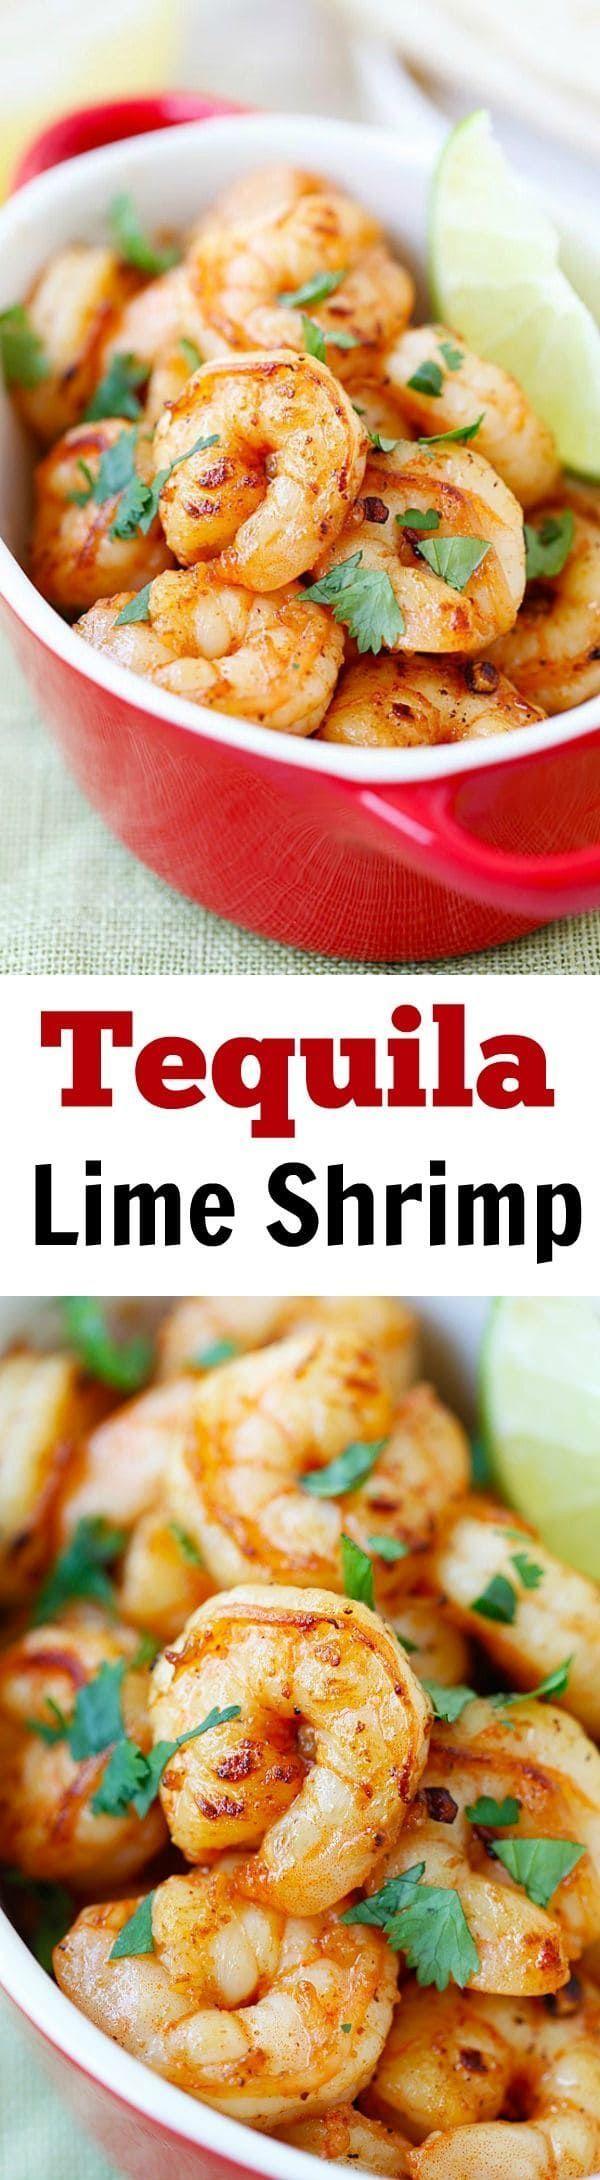 Tequila Lime Shrimp Shrimp With Tequila Lime Cilantro Crazy Easy And Budget